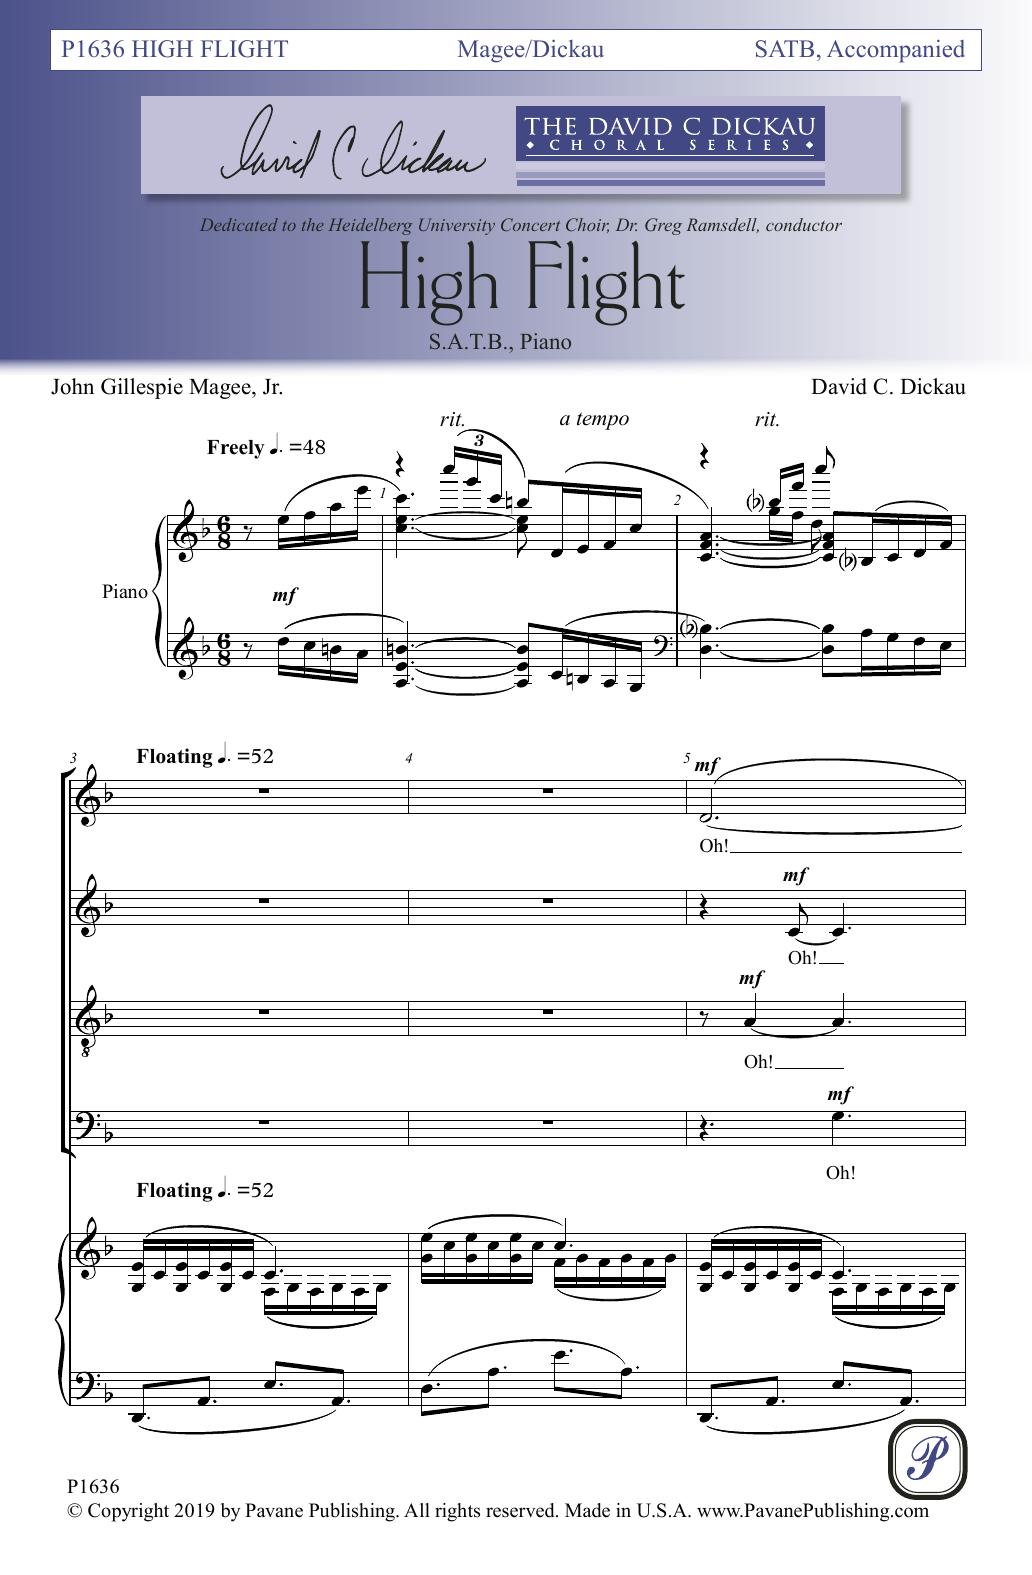 John Gillespie Magee, Jr. and David C. Dickau High Flight sheet music notes and chords. Download Printable PDF.